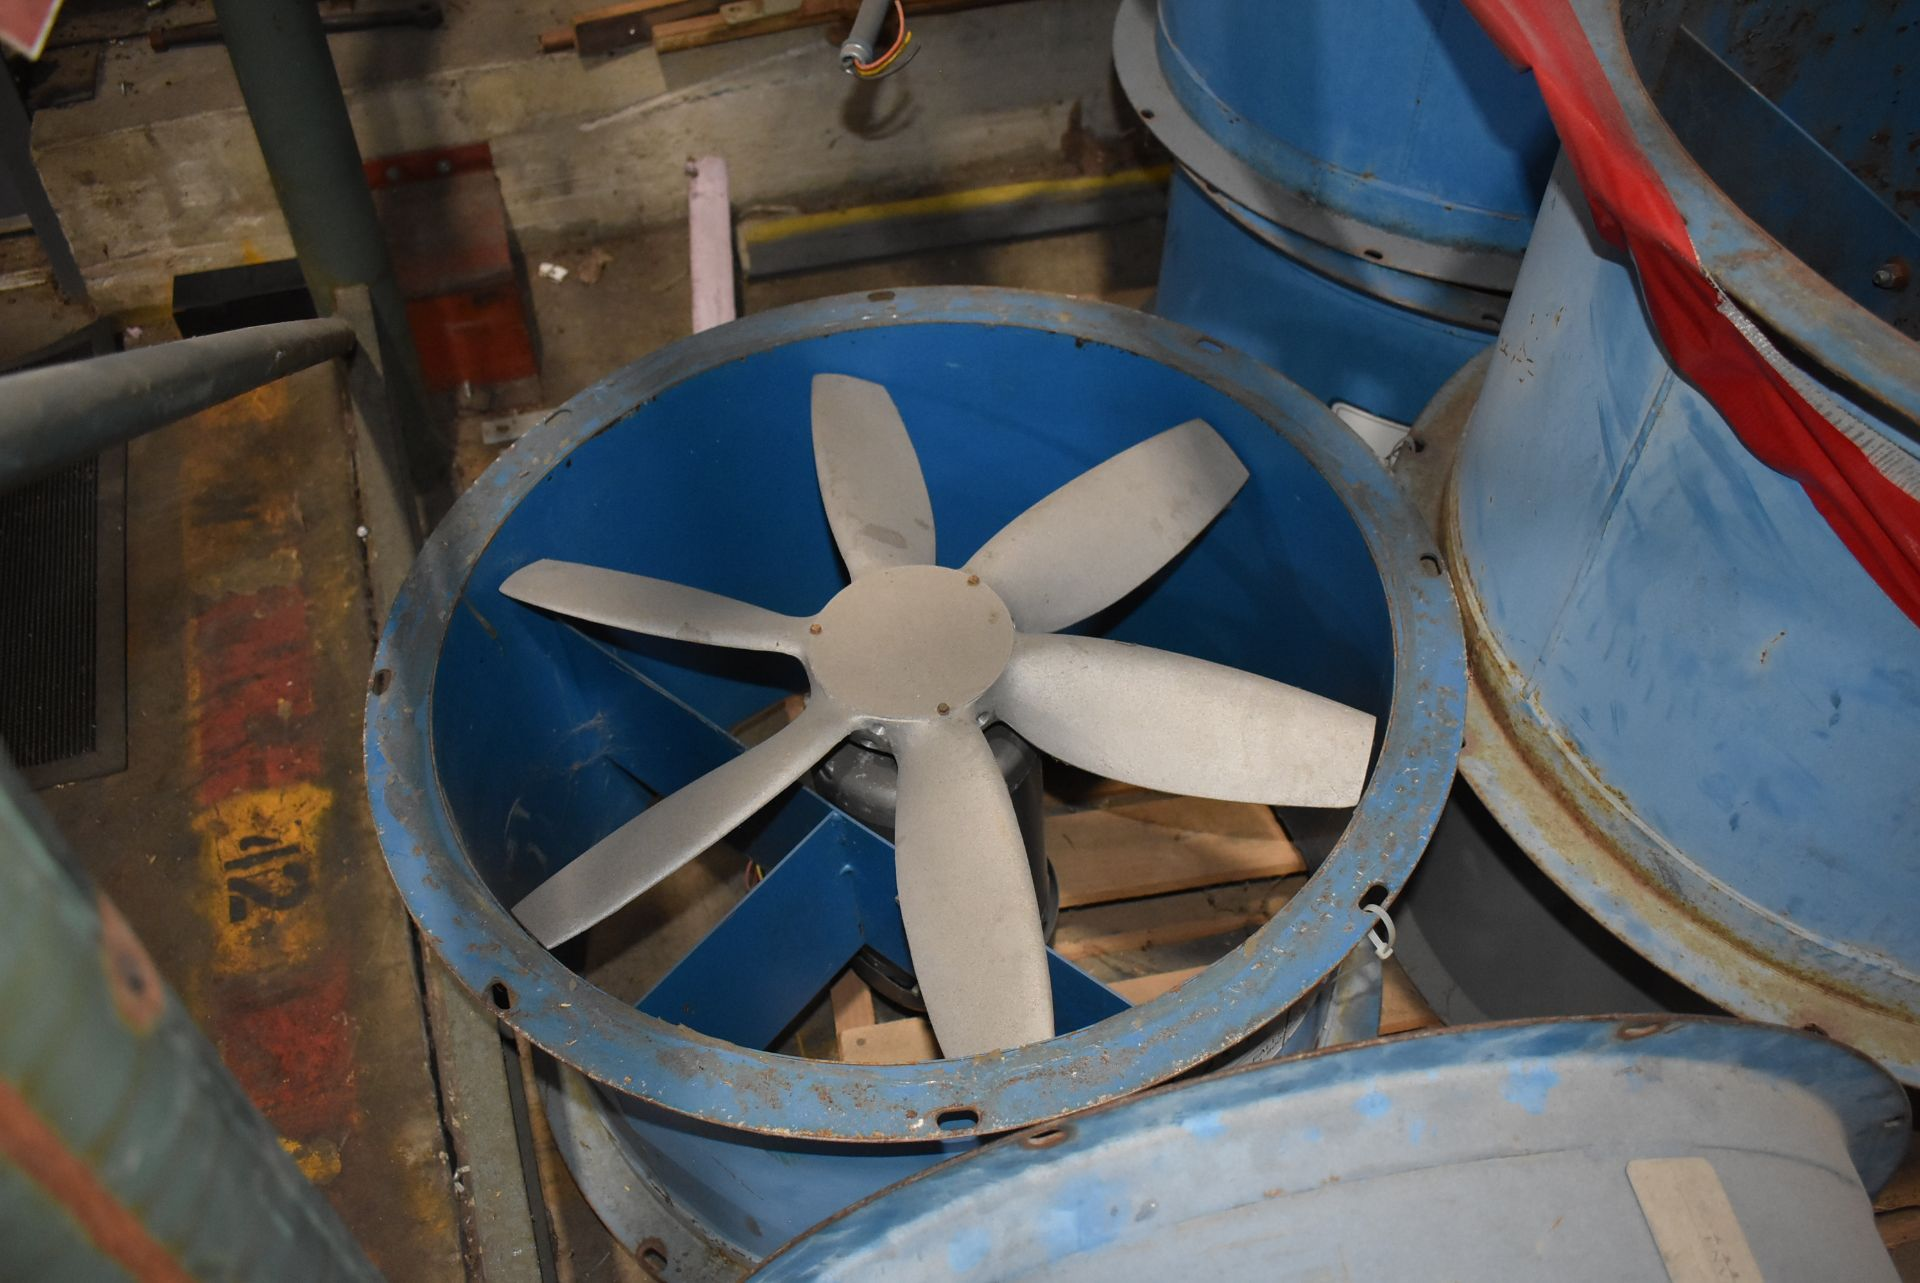 "Qty. (7) Alanco Environmental 24"" Fans w/2 HP Motors, Qty. (1) Dayton #4C66 Fan w/ 1/2 HP Motor - Image 3 of 3"